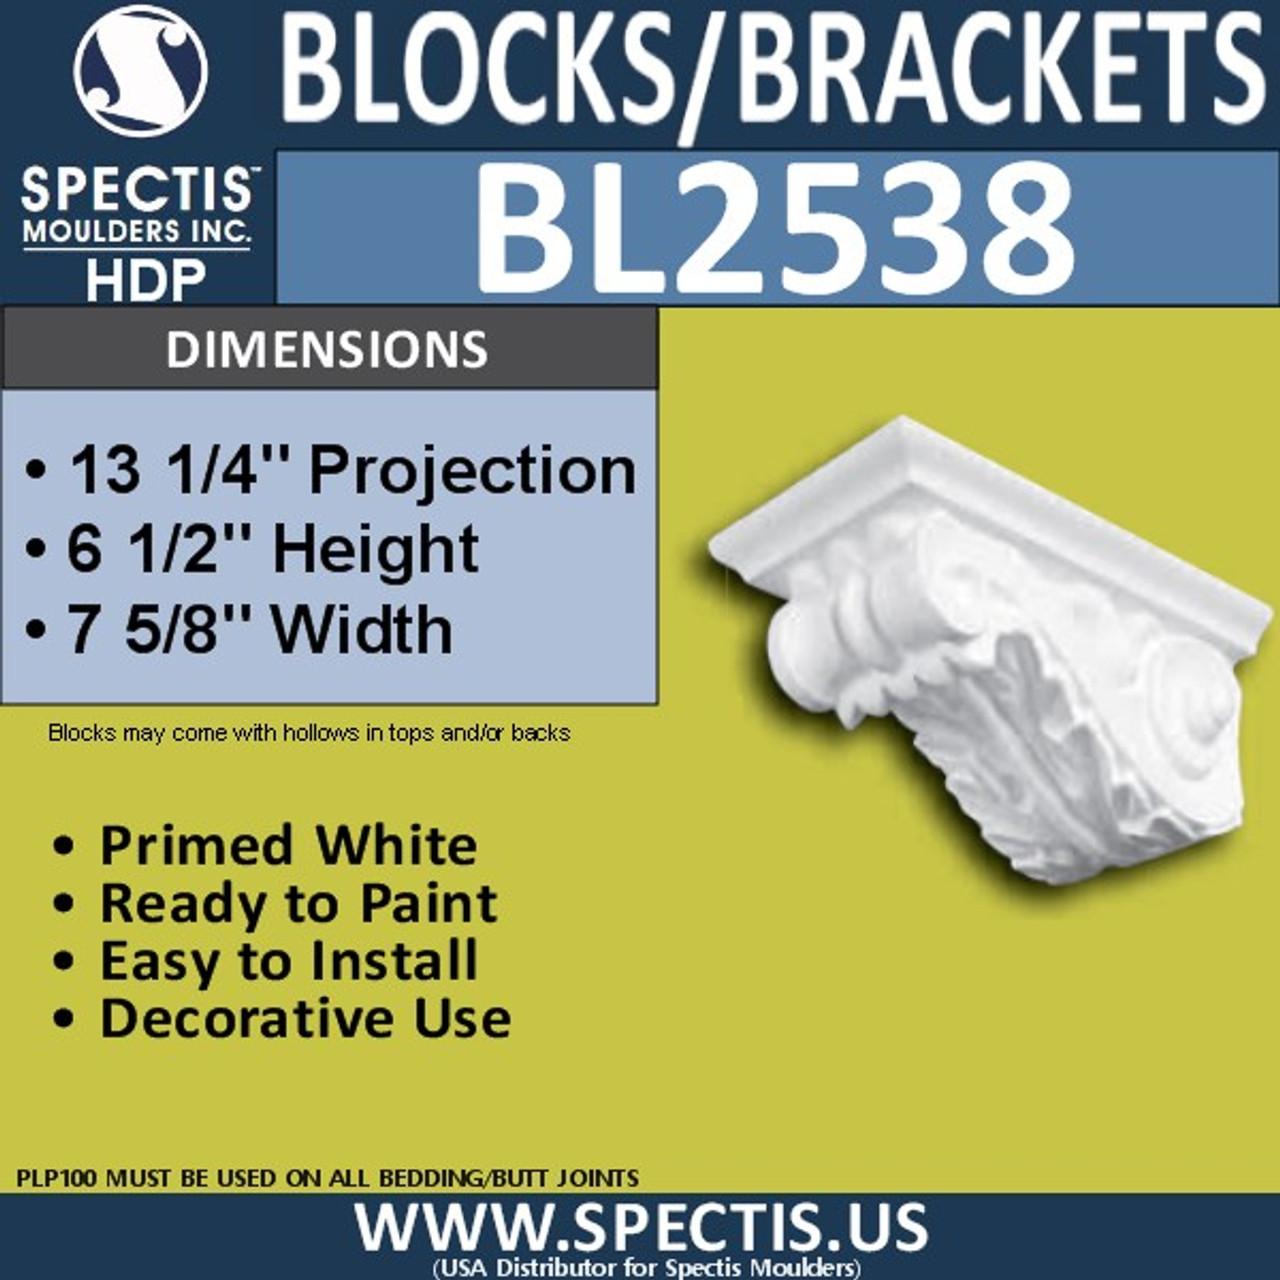 "BL2538 Eave Block or Bracket 7.5""W x 6.5""H x 13.25"" P"